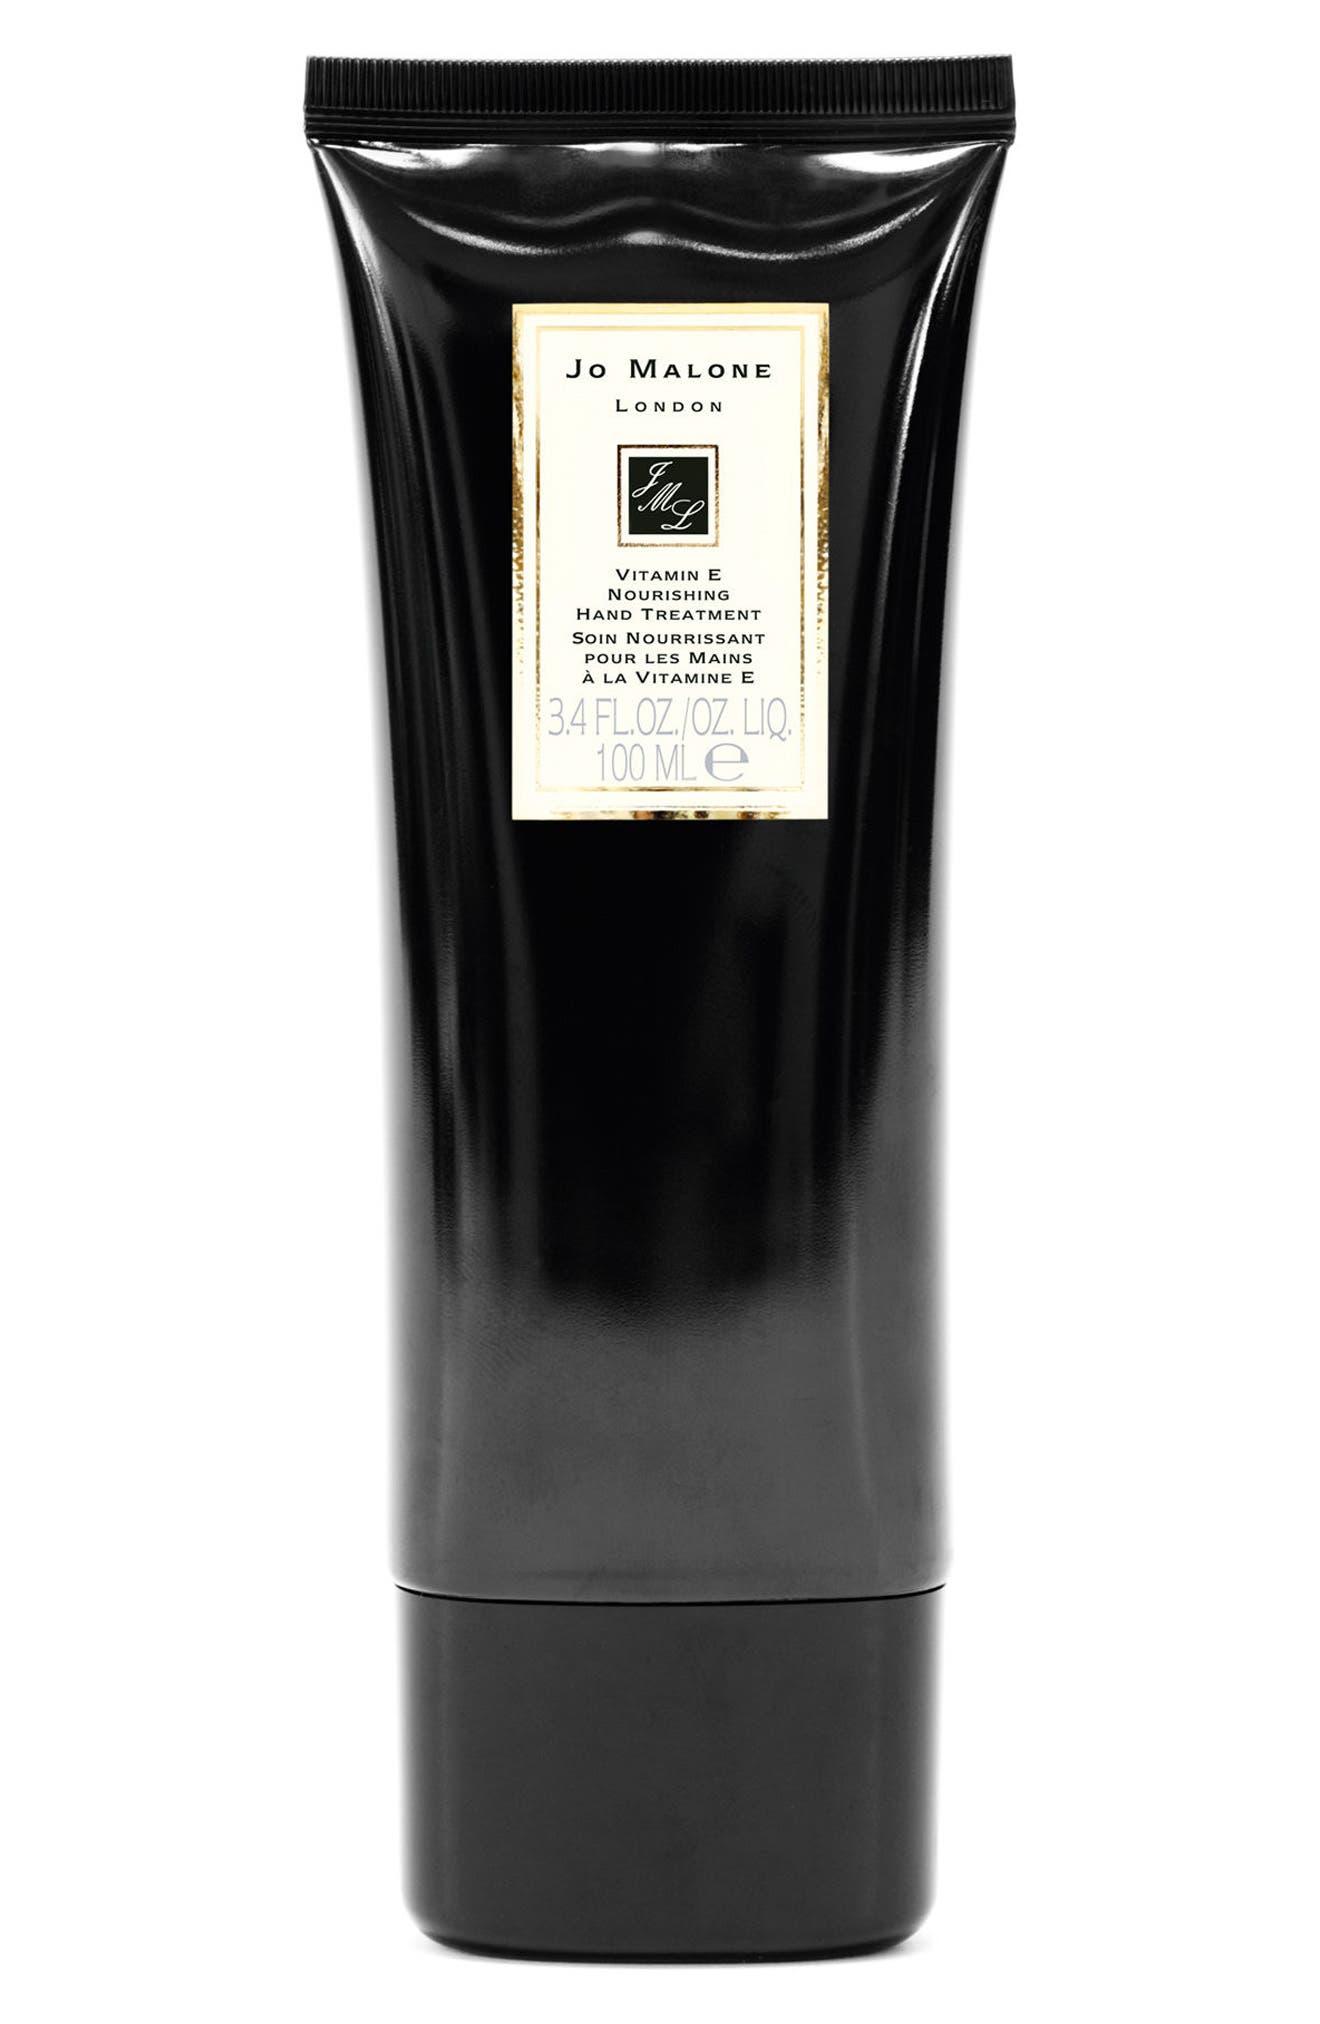 Alternate Image 1 Selected - Jo Malone London™ 'Vitamin E' Nourishing Hand Treatment